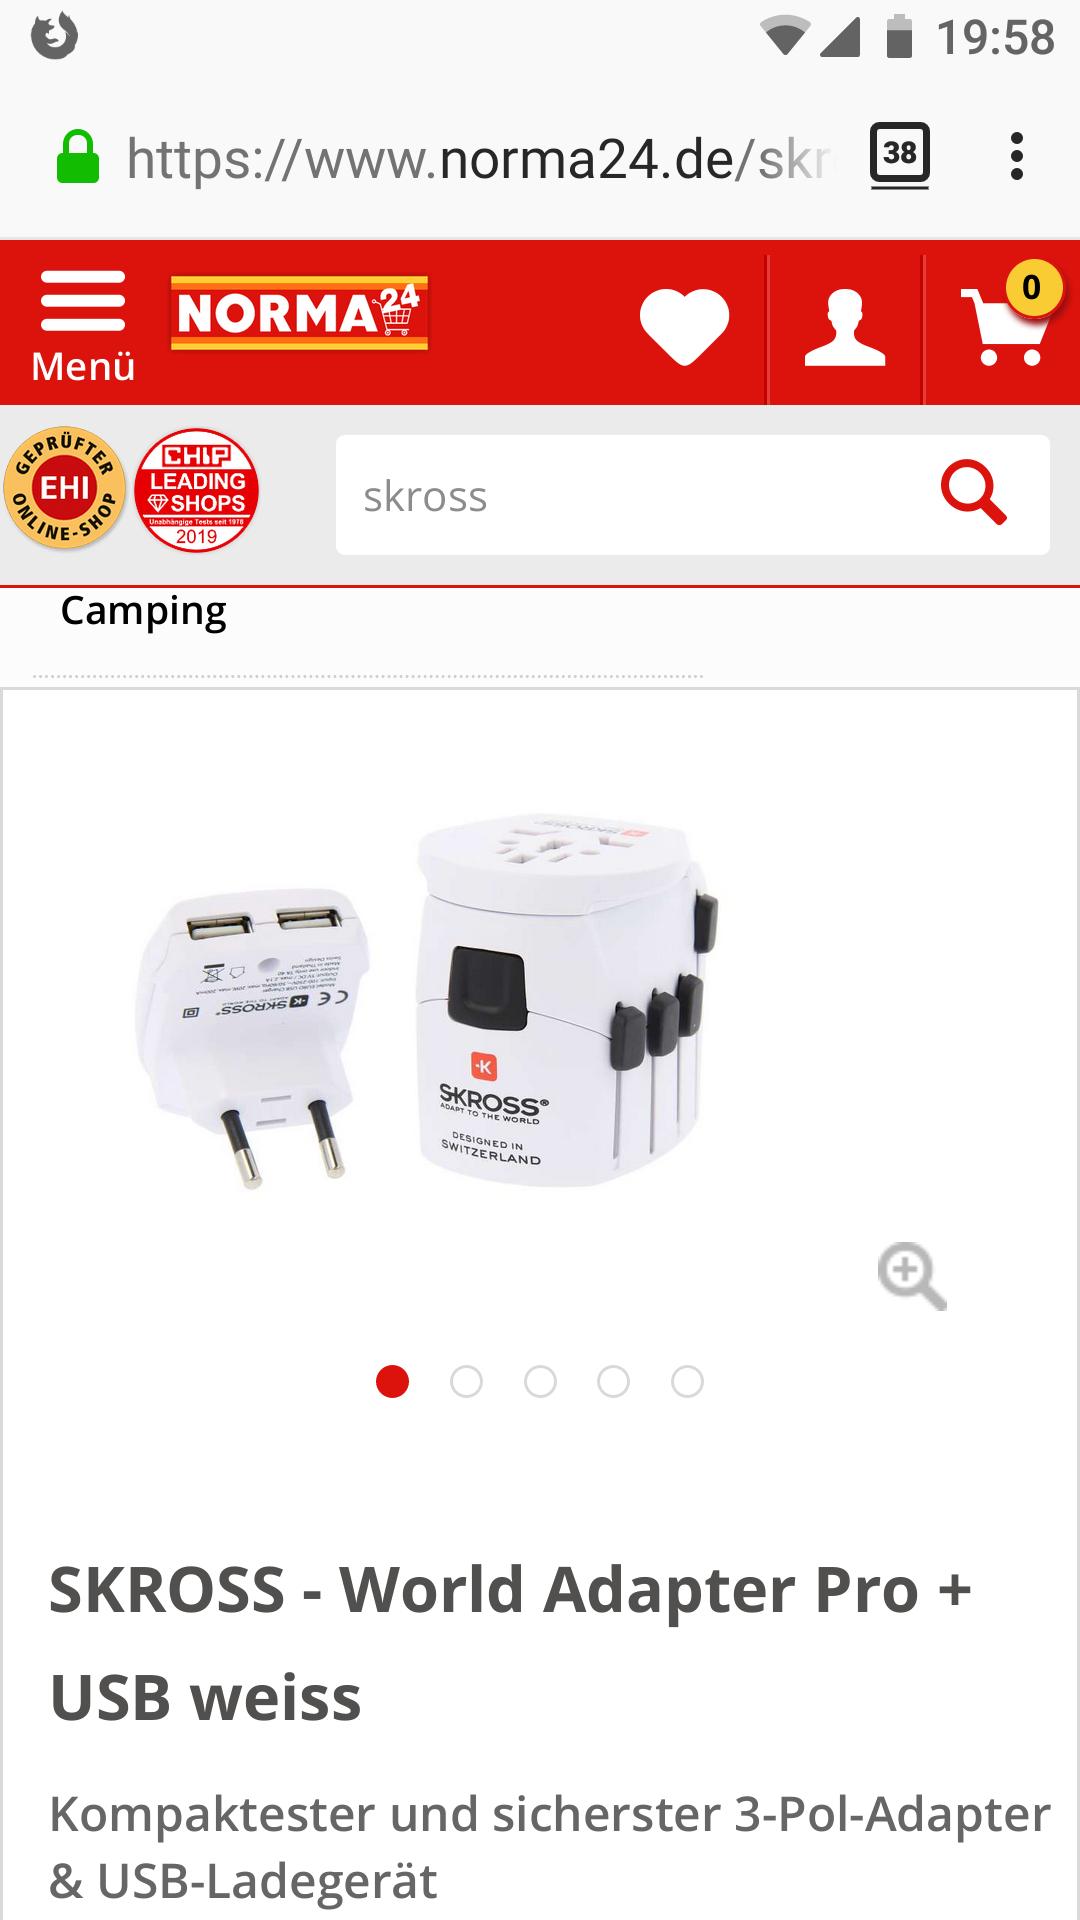 online bei Norma24 - SKROSS - Worldwide Adapter Pro + USB